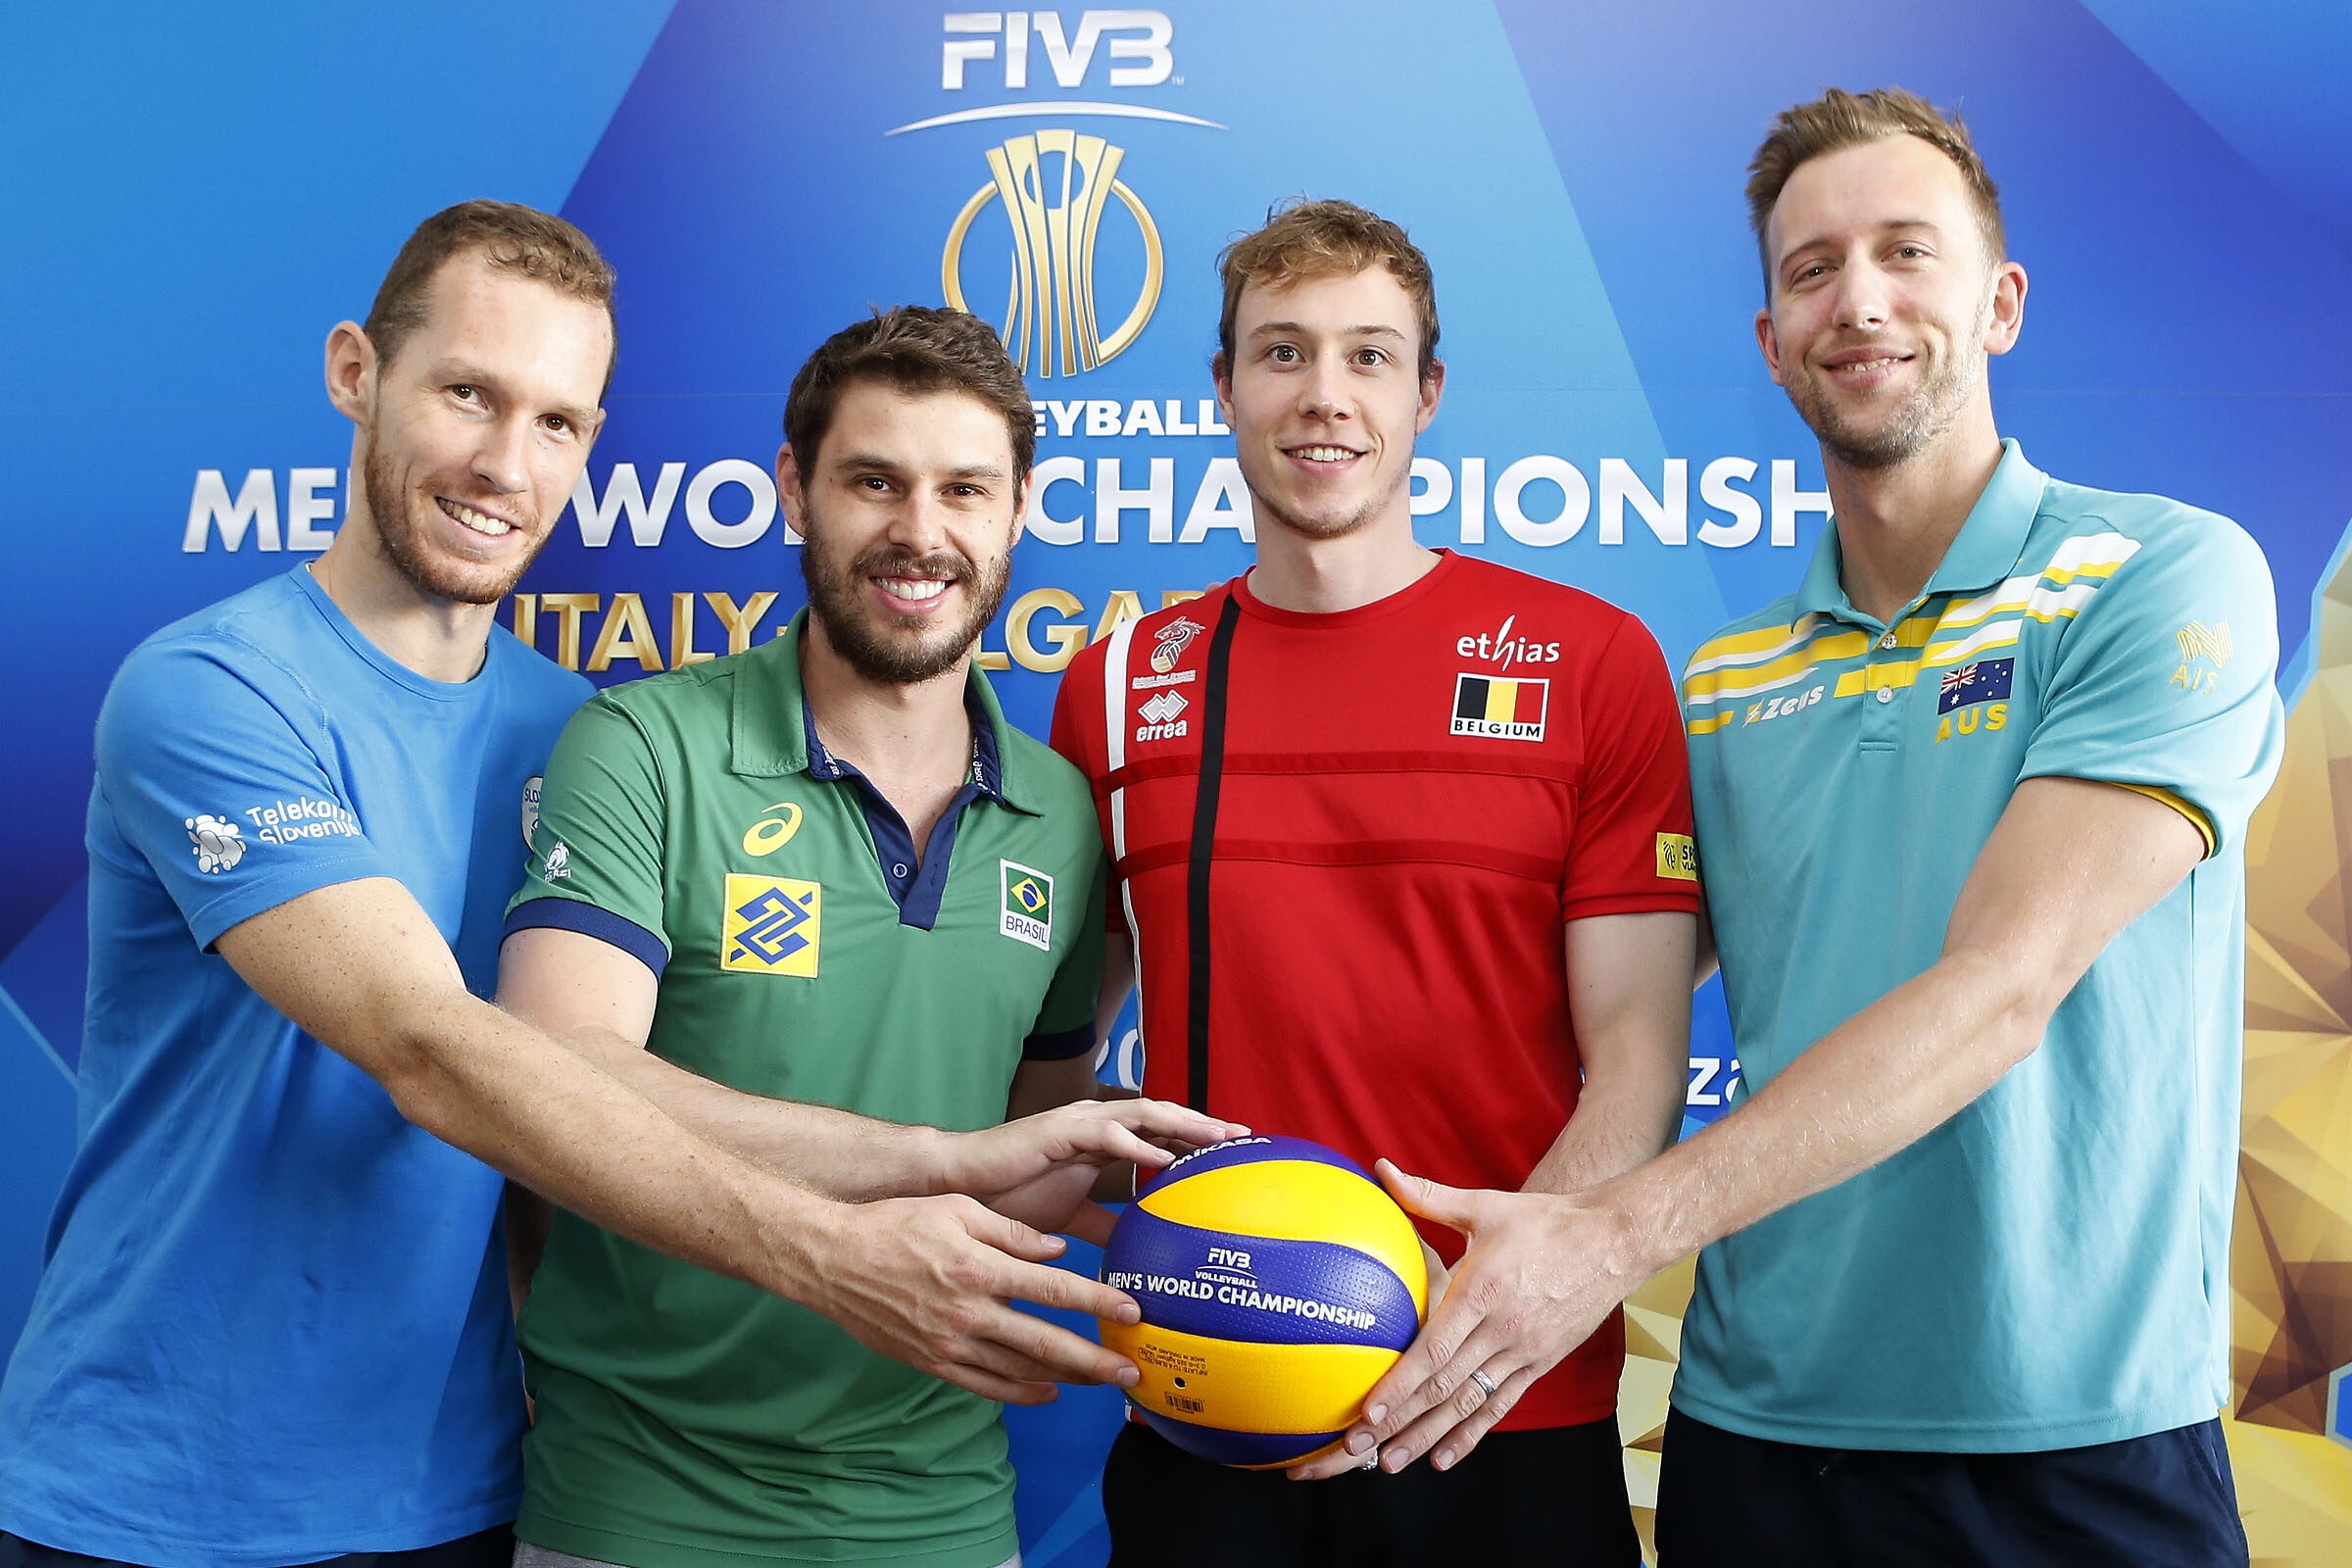 Mondiali volley, la parola ai protagonisti